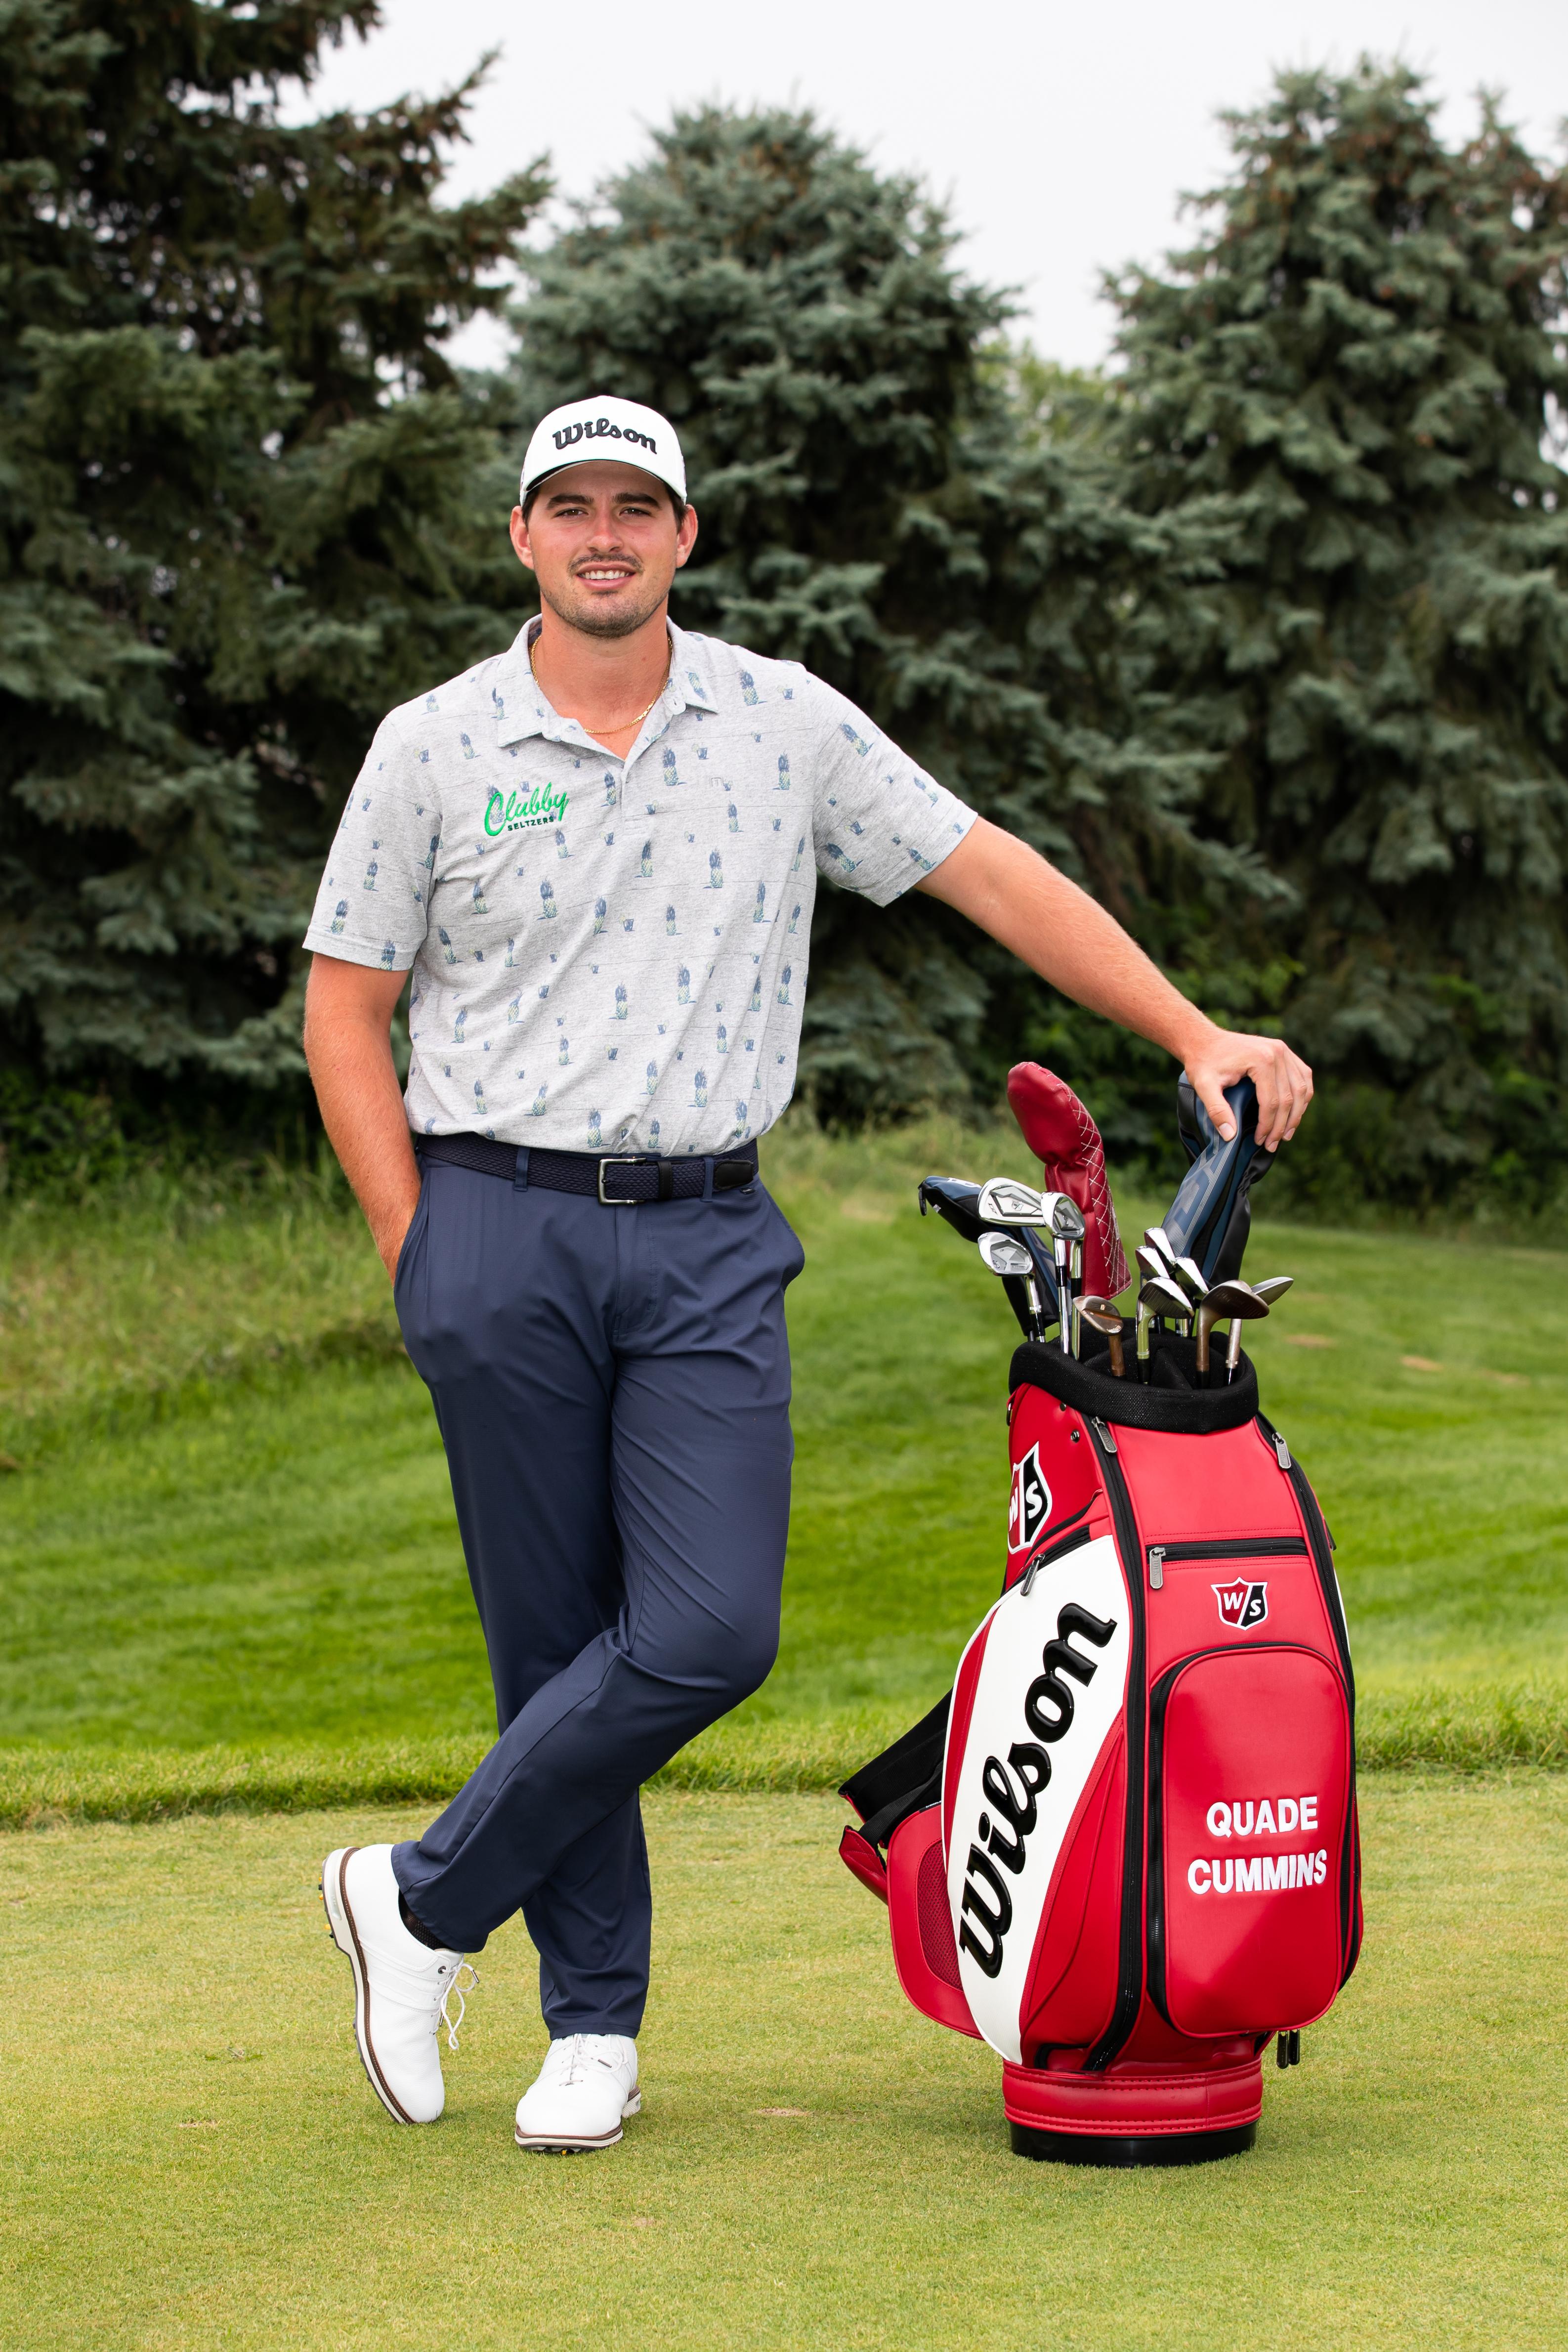 Quade Cummins and his golf bag